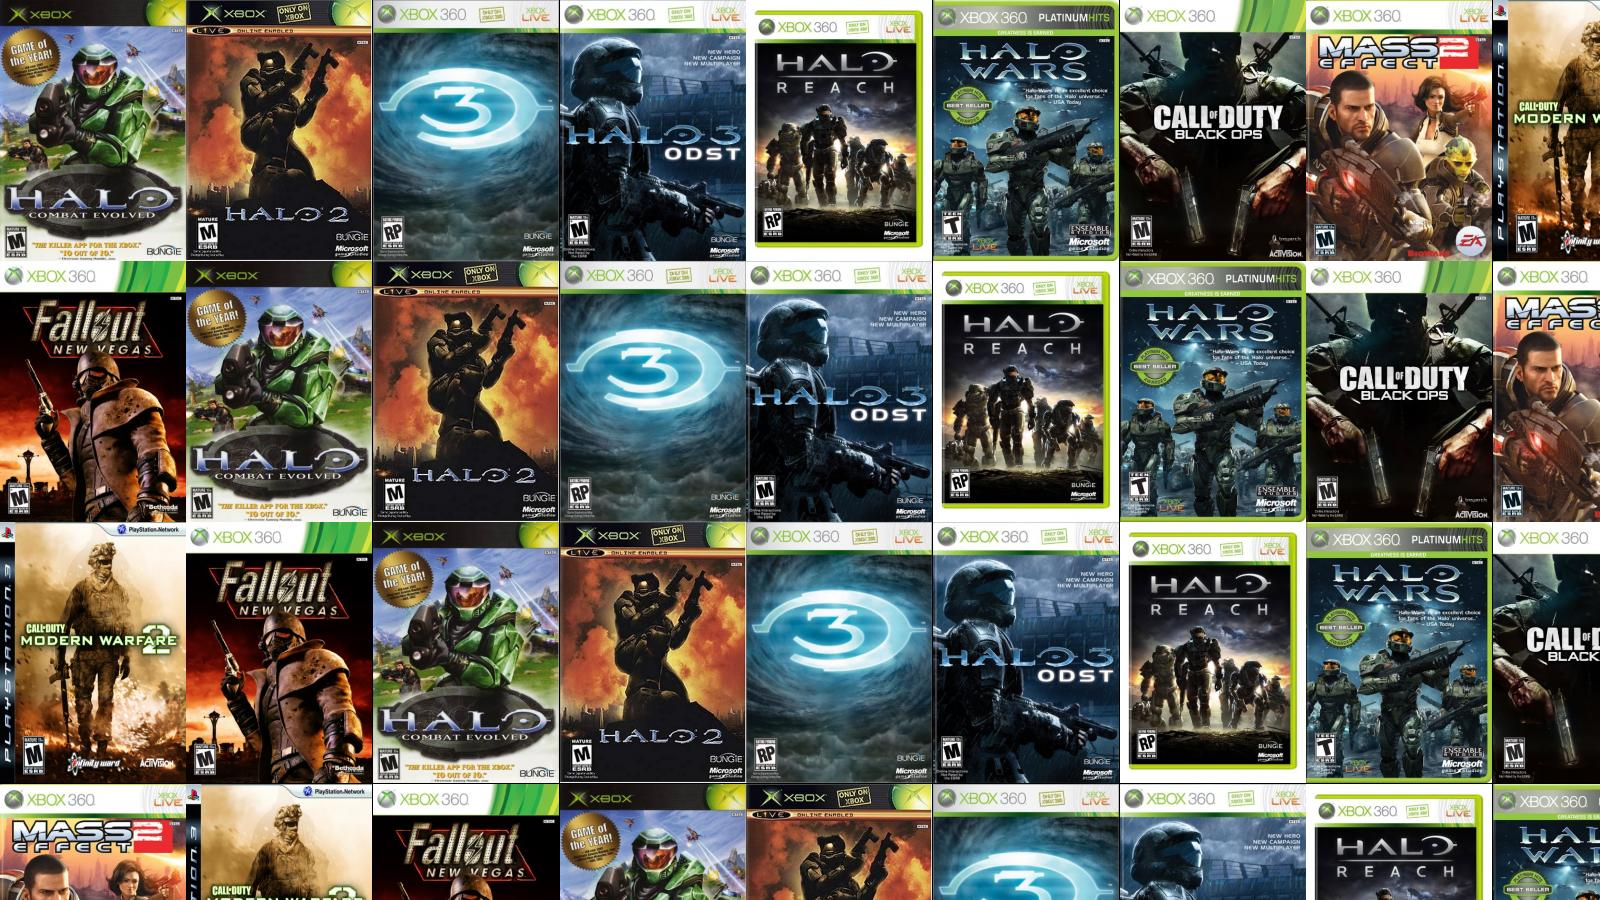 halo marine character models   Halo 5: Guardians   Forums   Halo ...